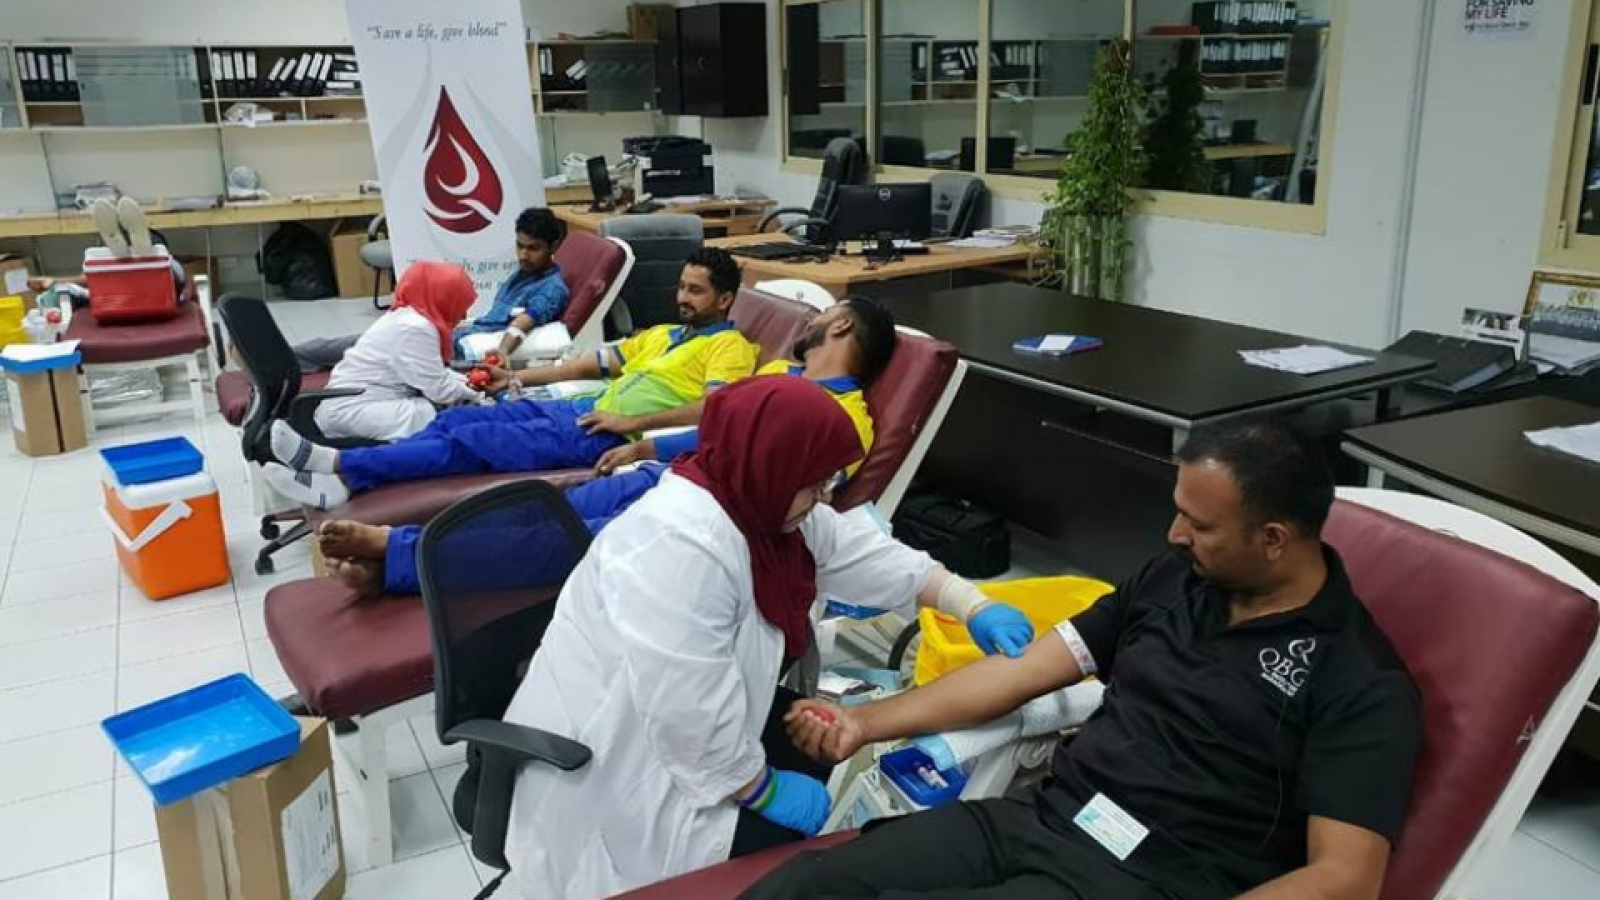 QBG UAE Holds Blood Donation Campaign at Qurum Village 1, Jebel Ali